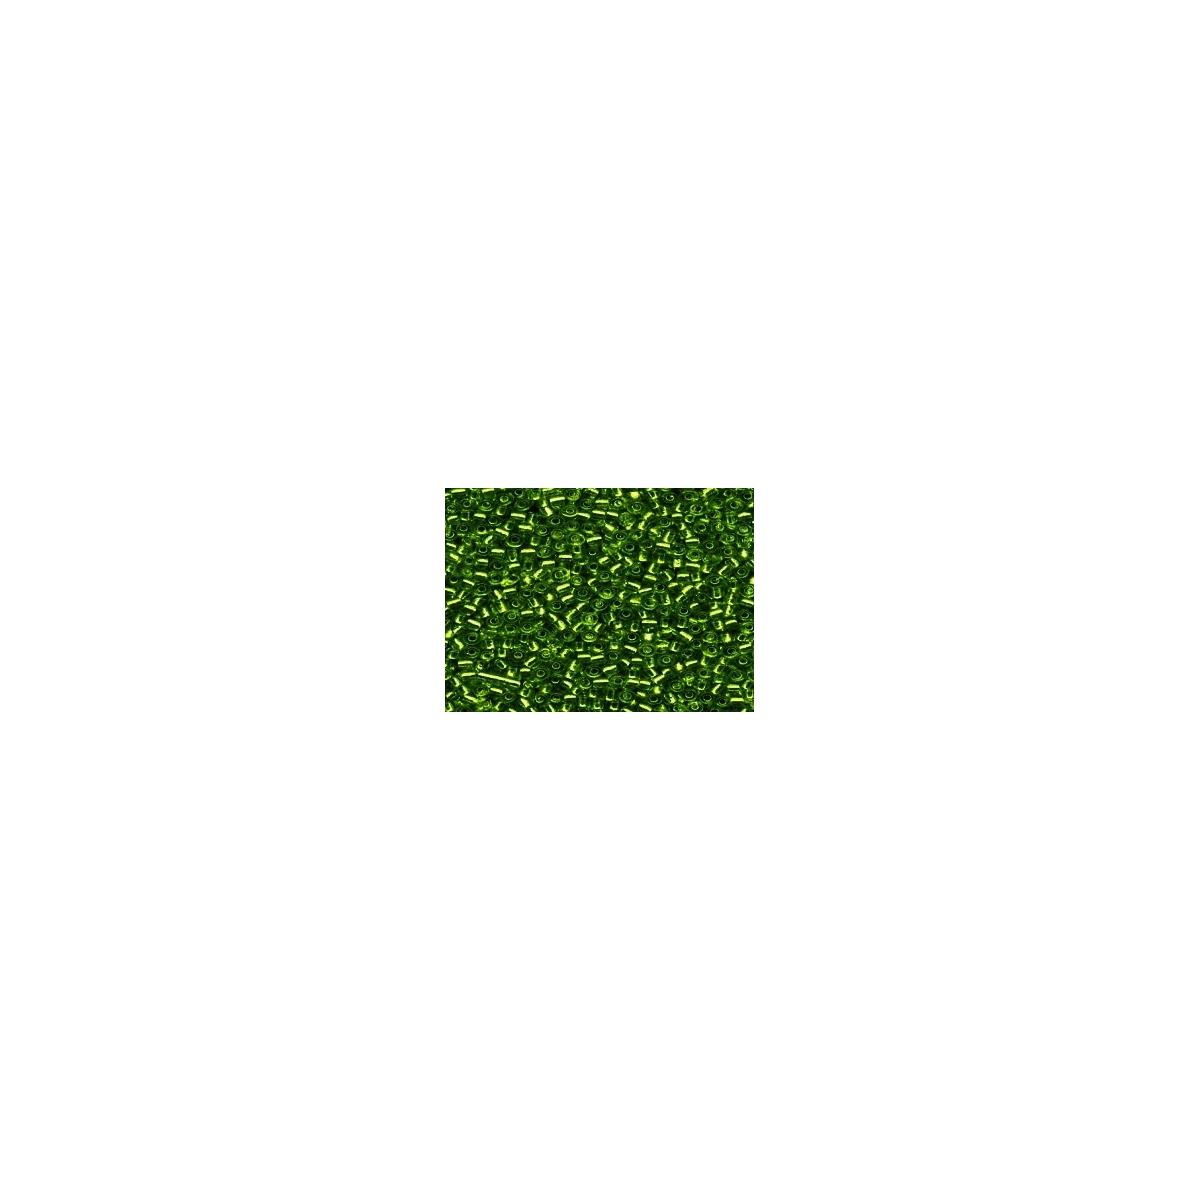 Rocalla nº 1 - Verde Oscuro Brillante